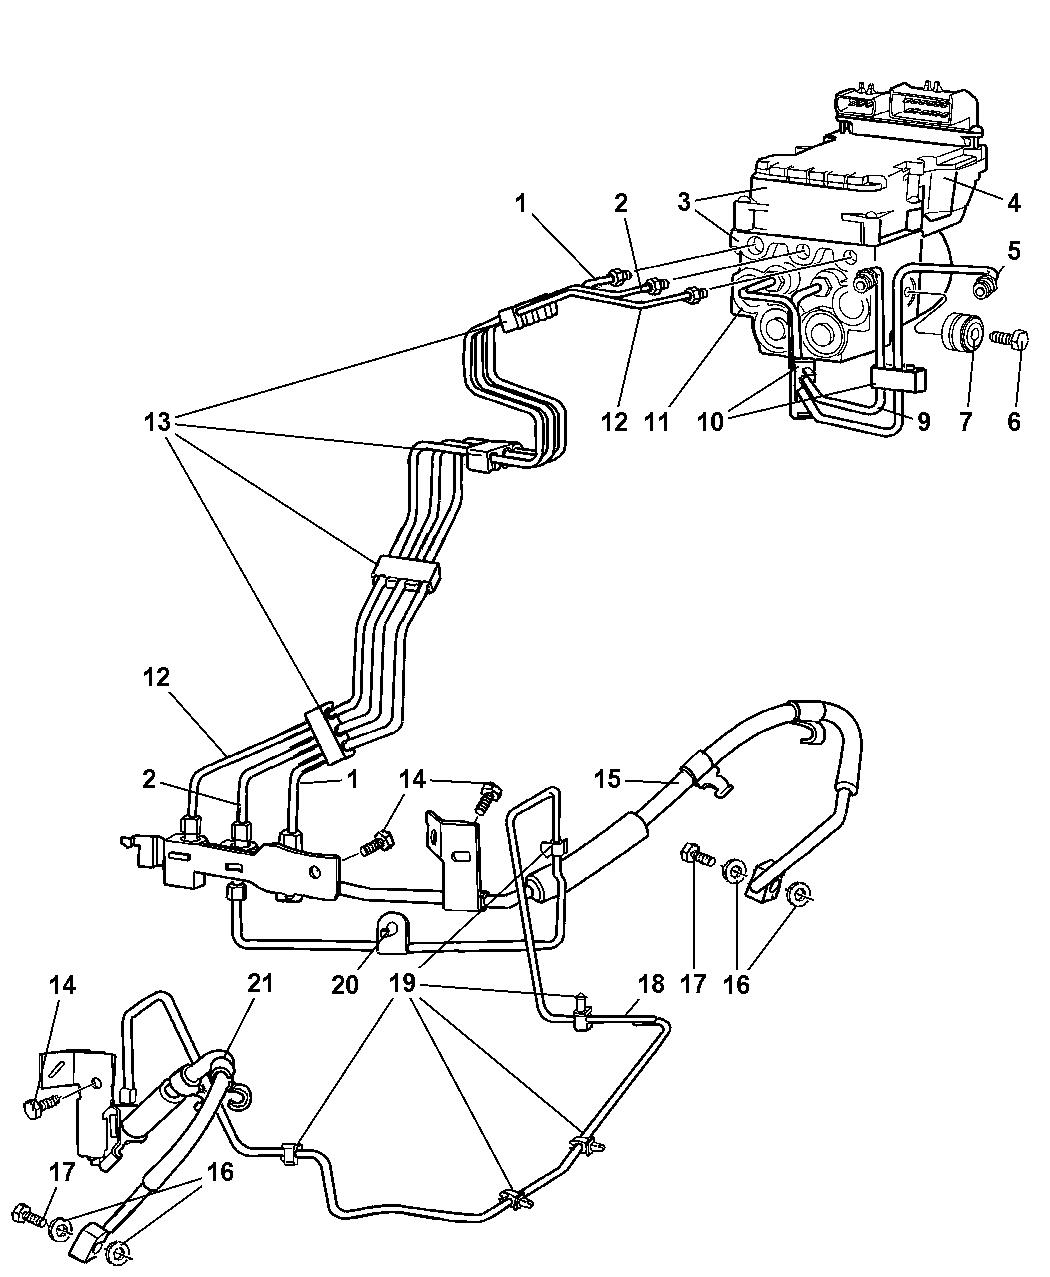 2001 Dodge Ram 1500 Brake Line Diagram Wiring Diagram